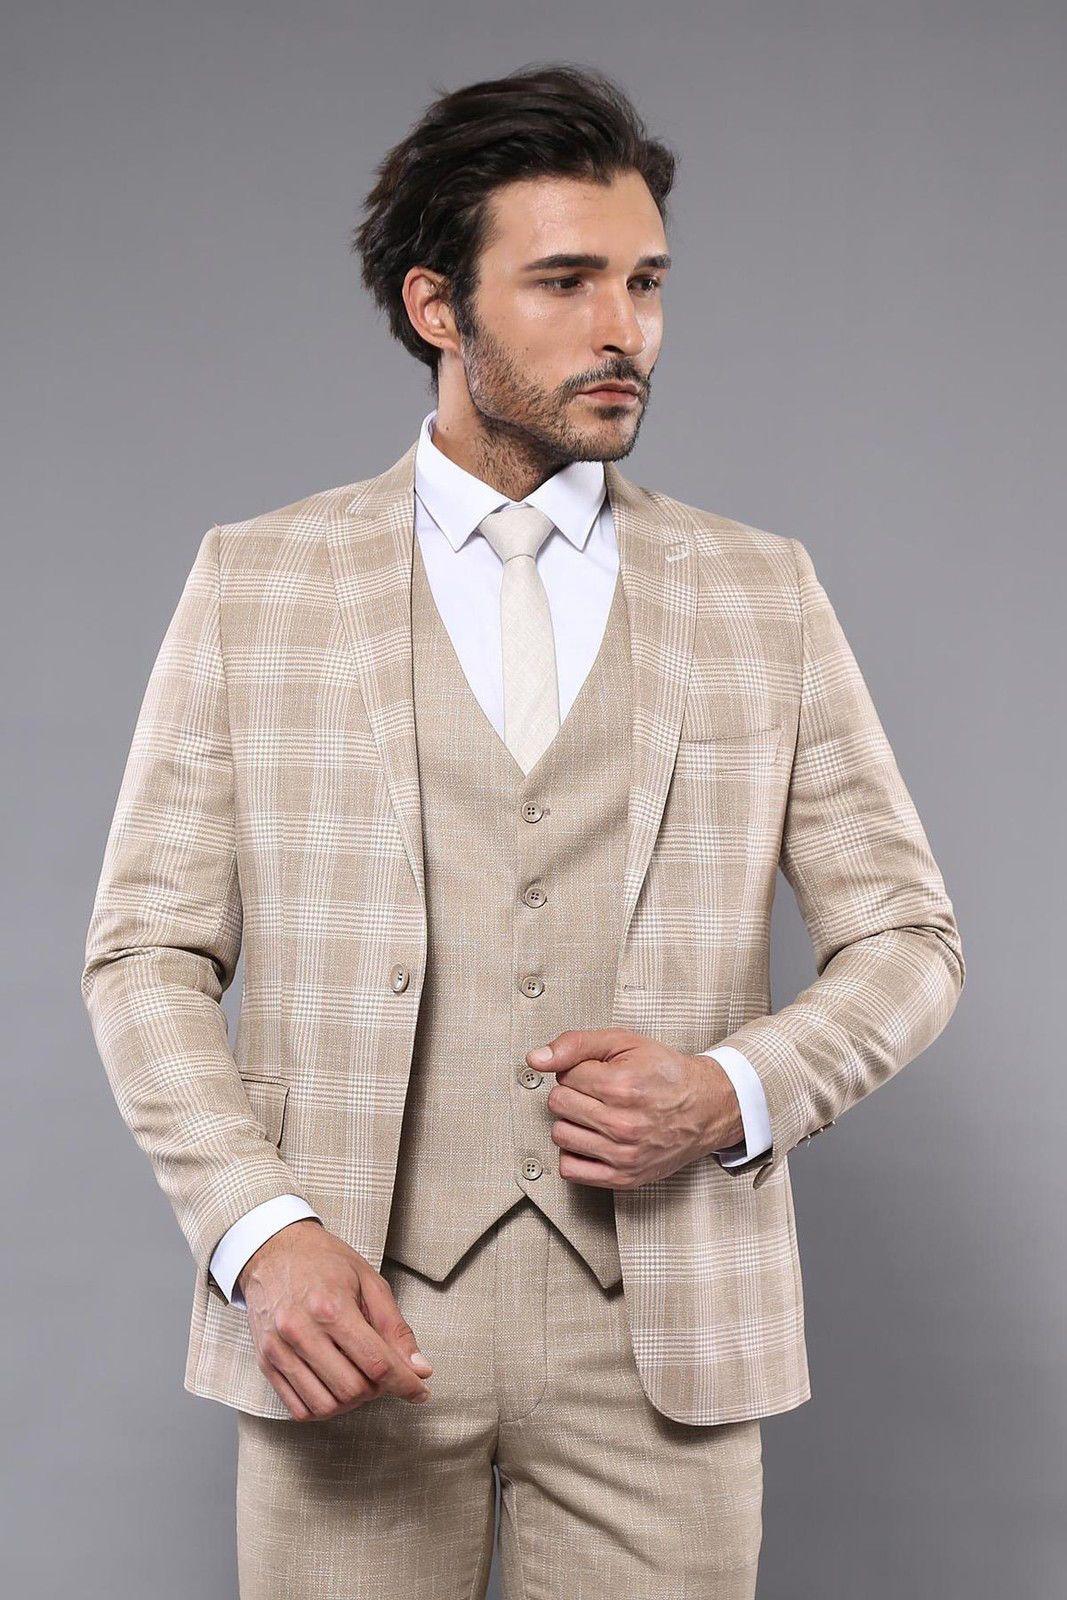 طقم بدلة رسمية بيج بمربعات رجالي Suits Formal Suits Checked Blazer